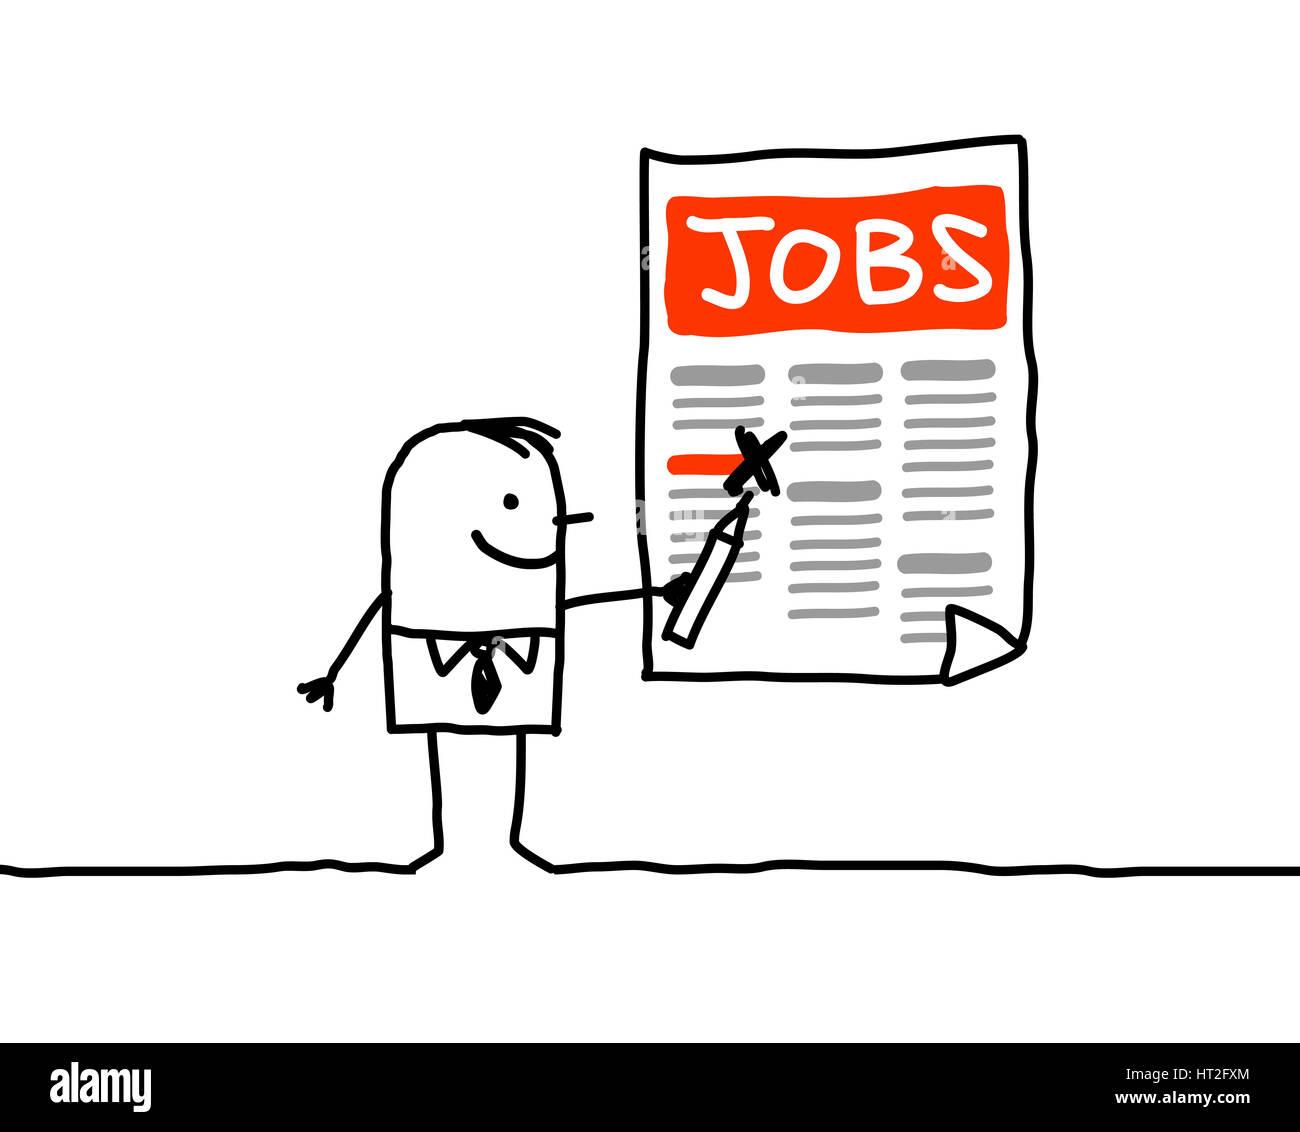 Cartoon Characters Man Looking For A Job Stock Photo 135280732